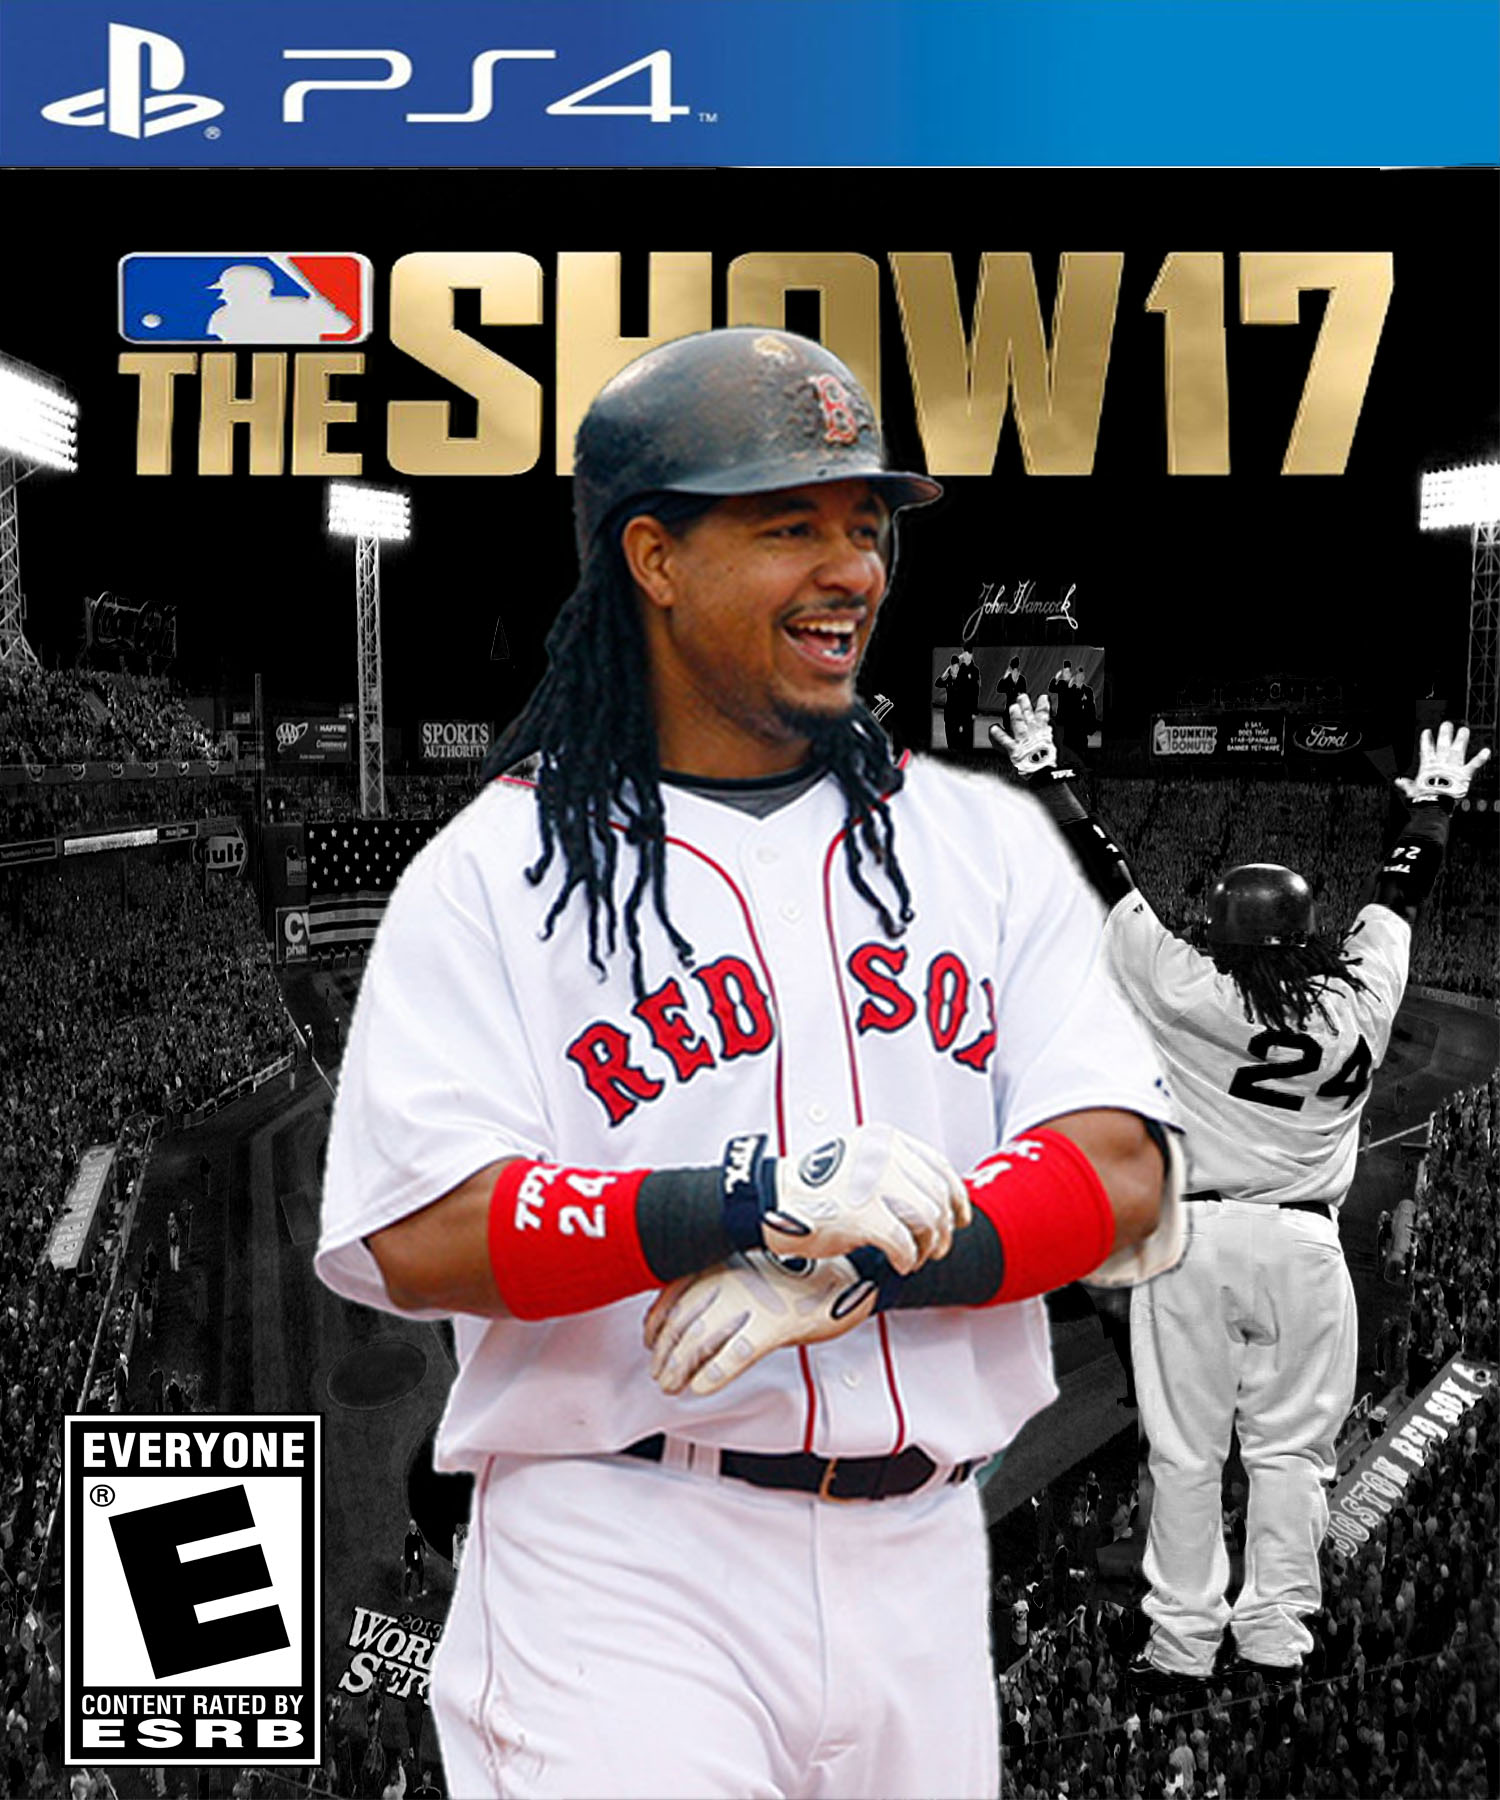 7fe0c69b580 MLB 17 The Show Custom Covers - Ryandillon12 s Blog - Operation Sports